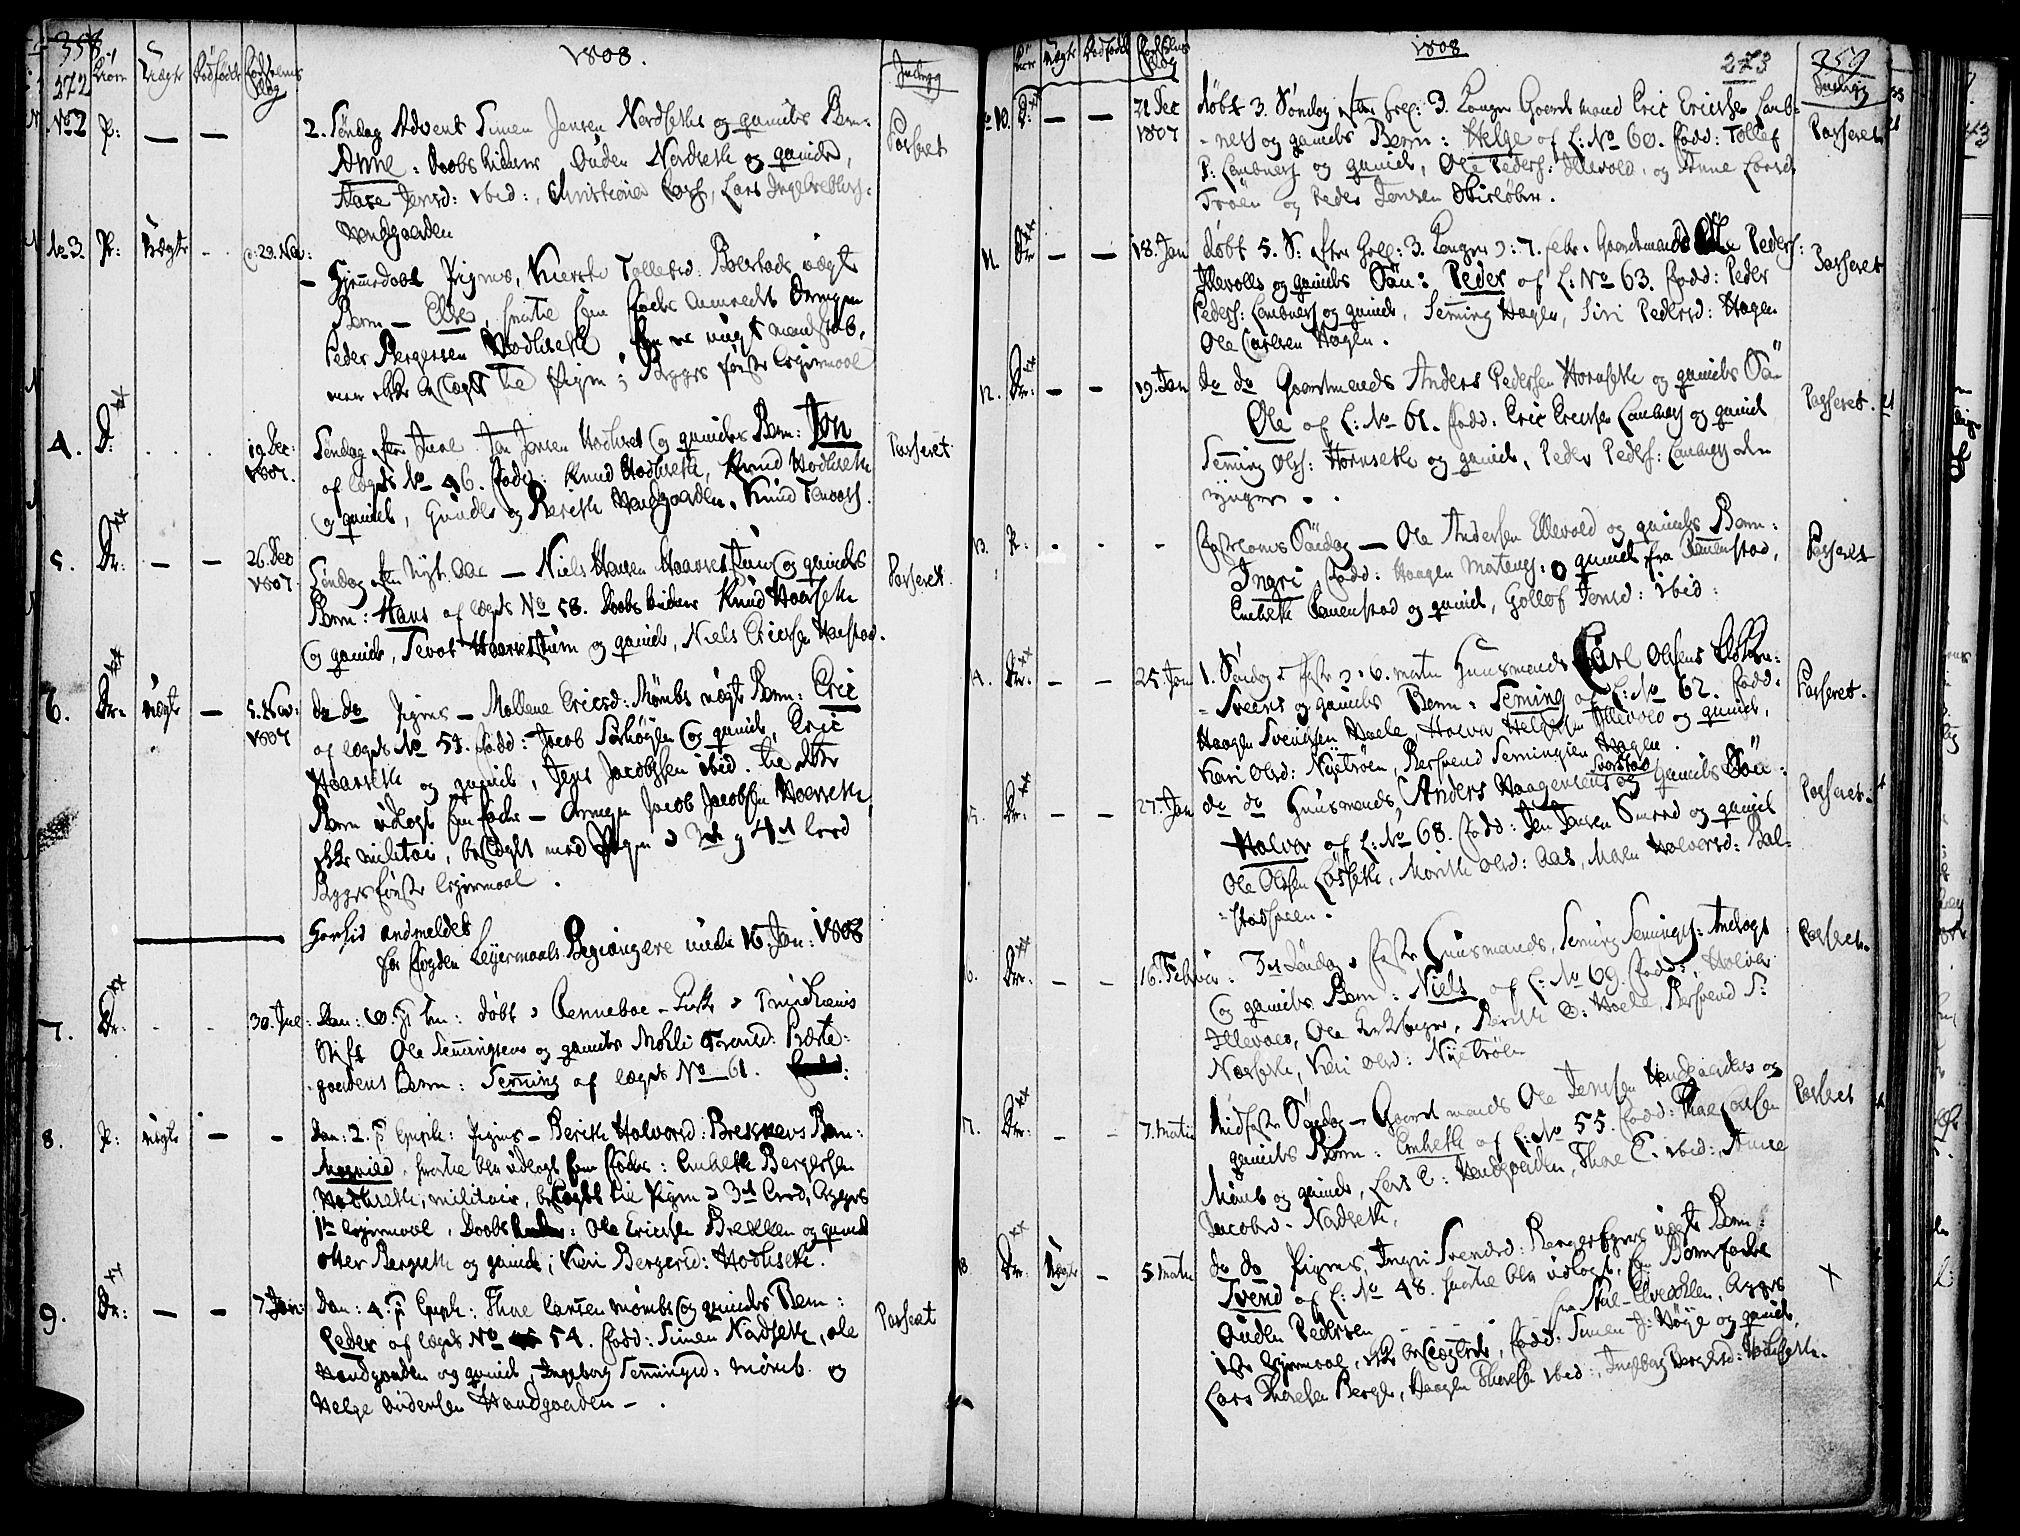 SAH, Rendalen prestekontor, H/Ha/Haa/L0002: Ministerialbok nr. 2, 1788-1814, s. 272-273